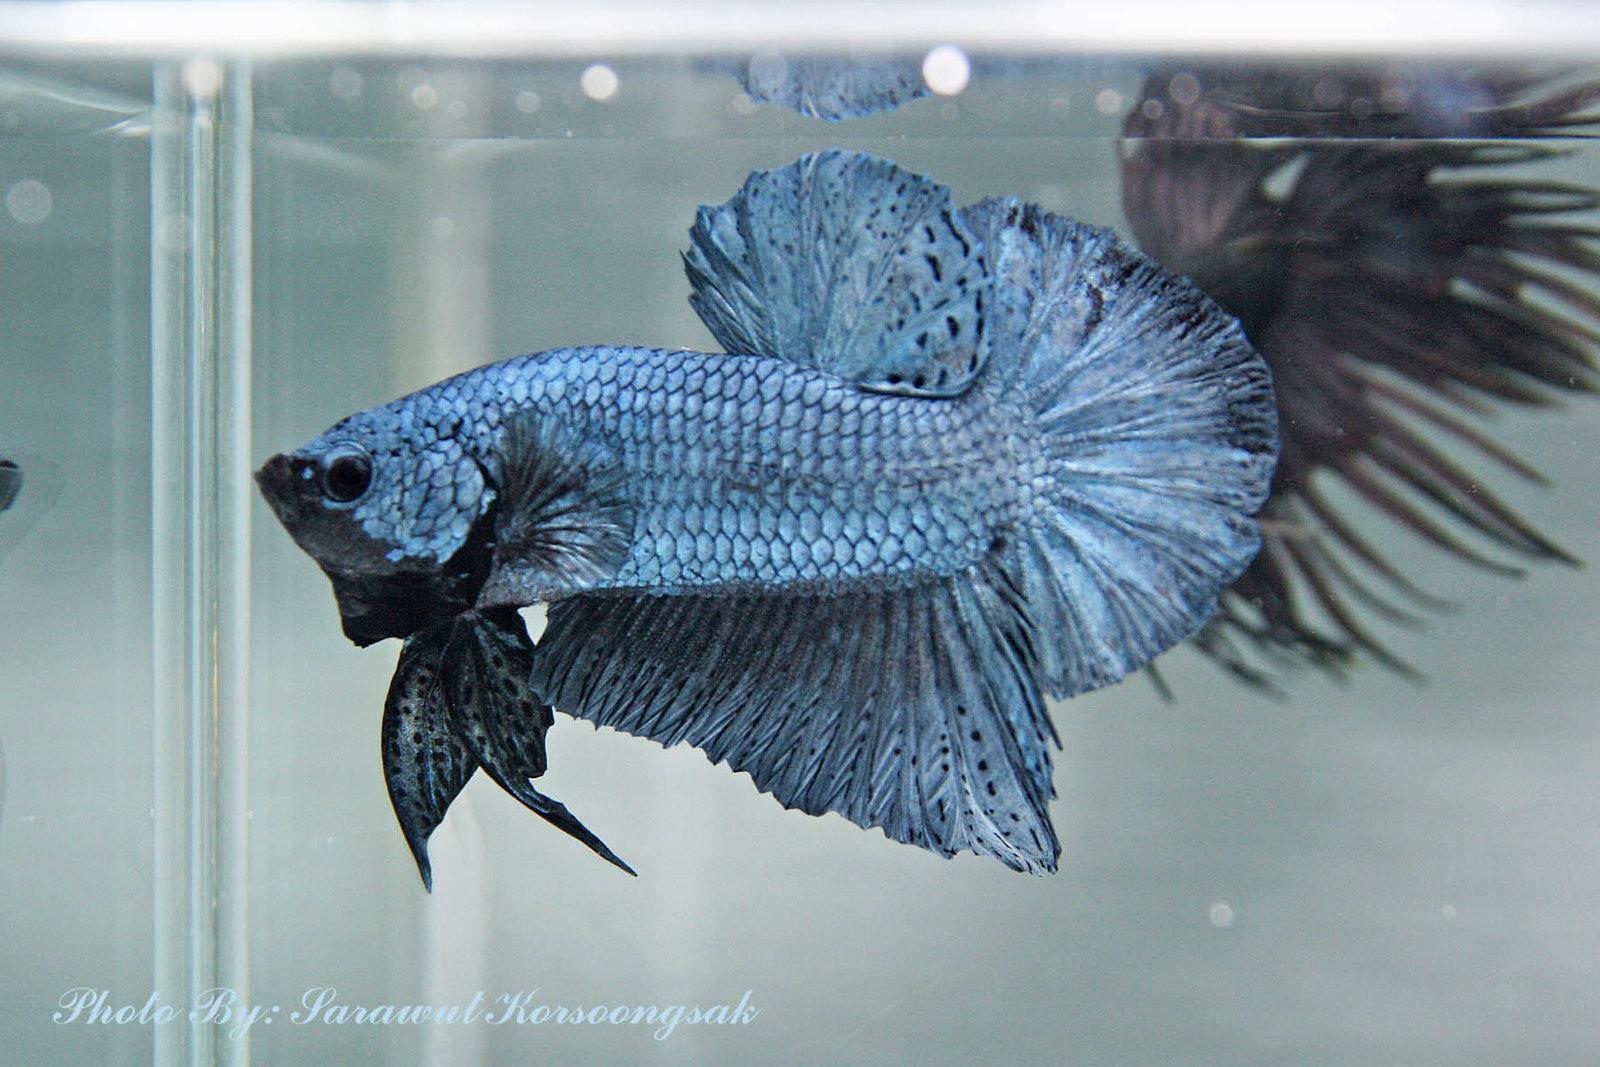 Ikan Cupang Steel Blue Betta - Ikanhiasku.net